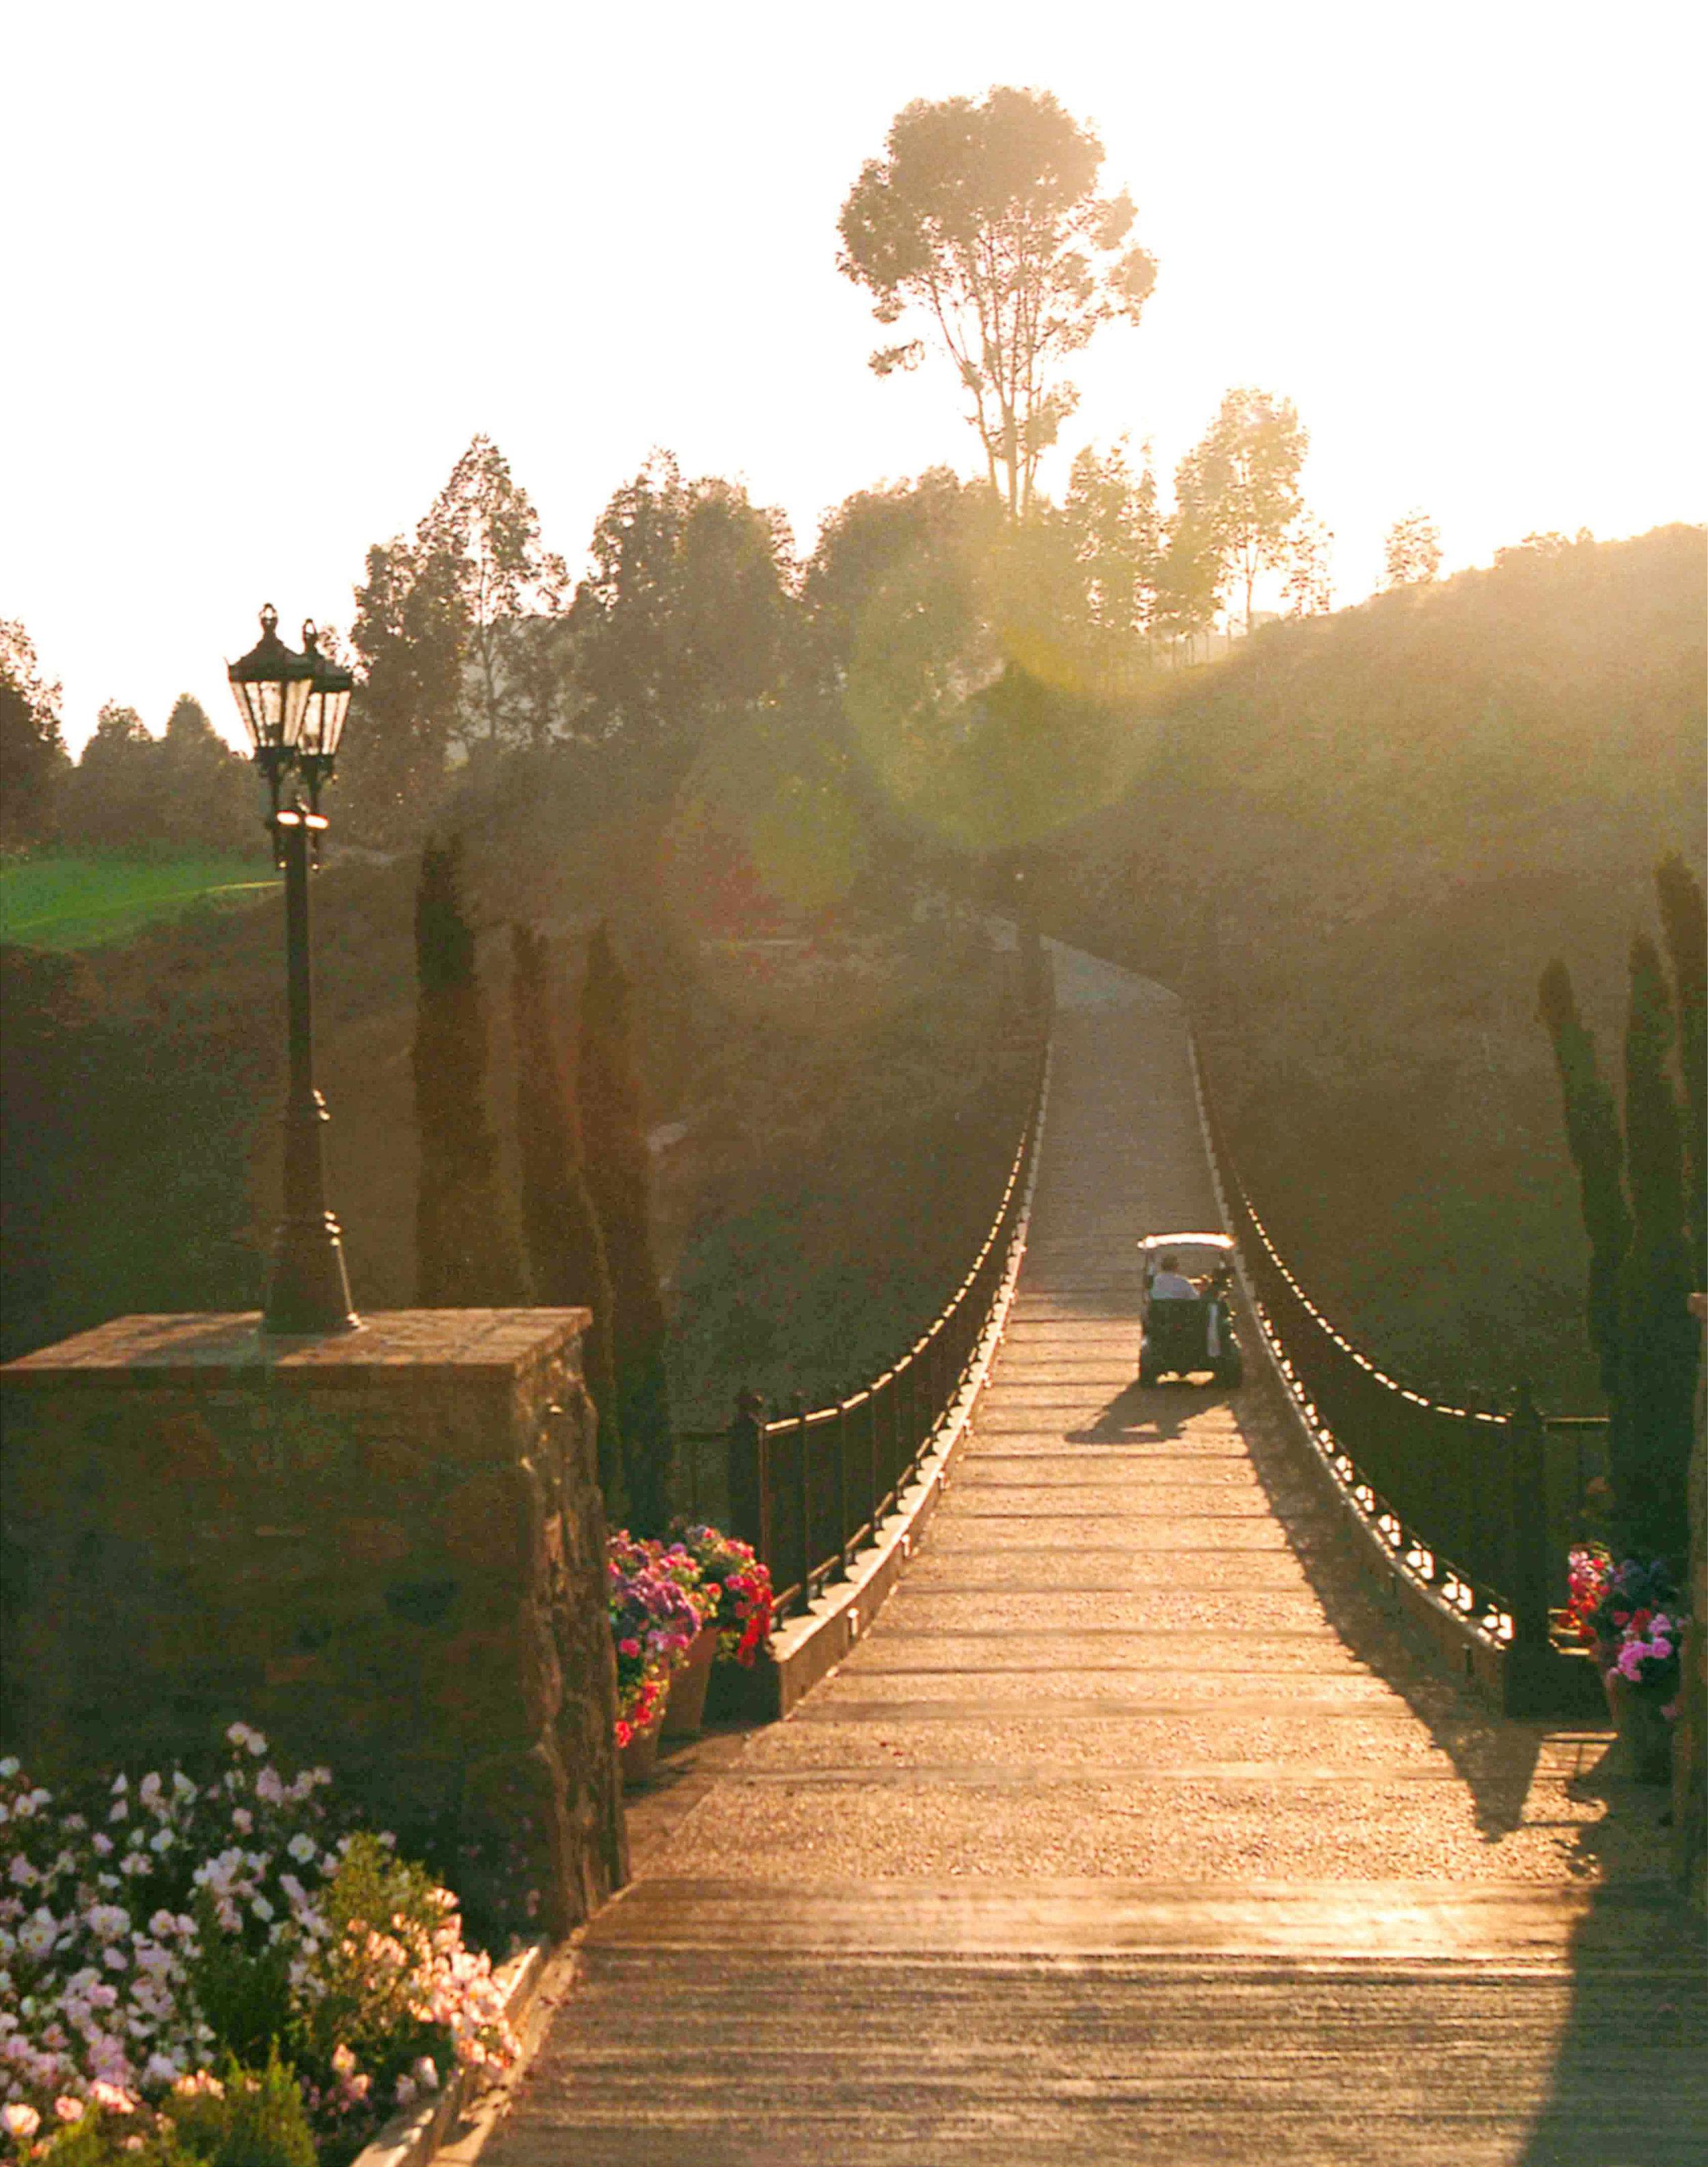 Kimball-Hall_-Golf-Bridge.jpg